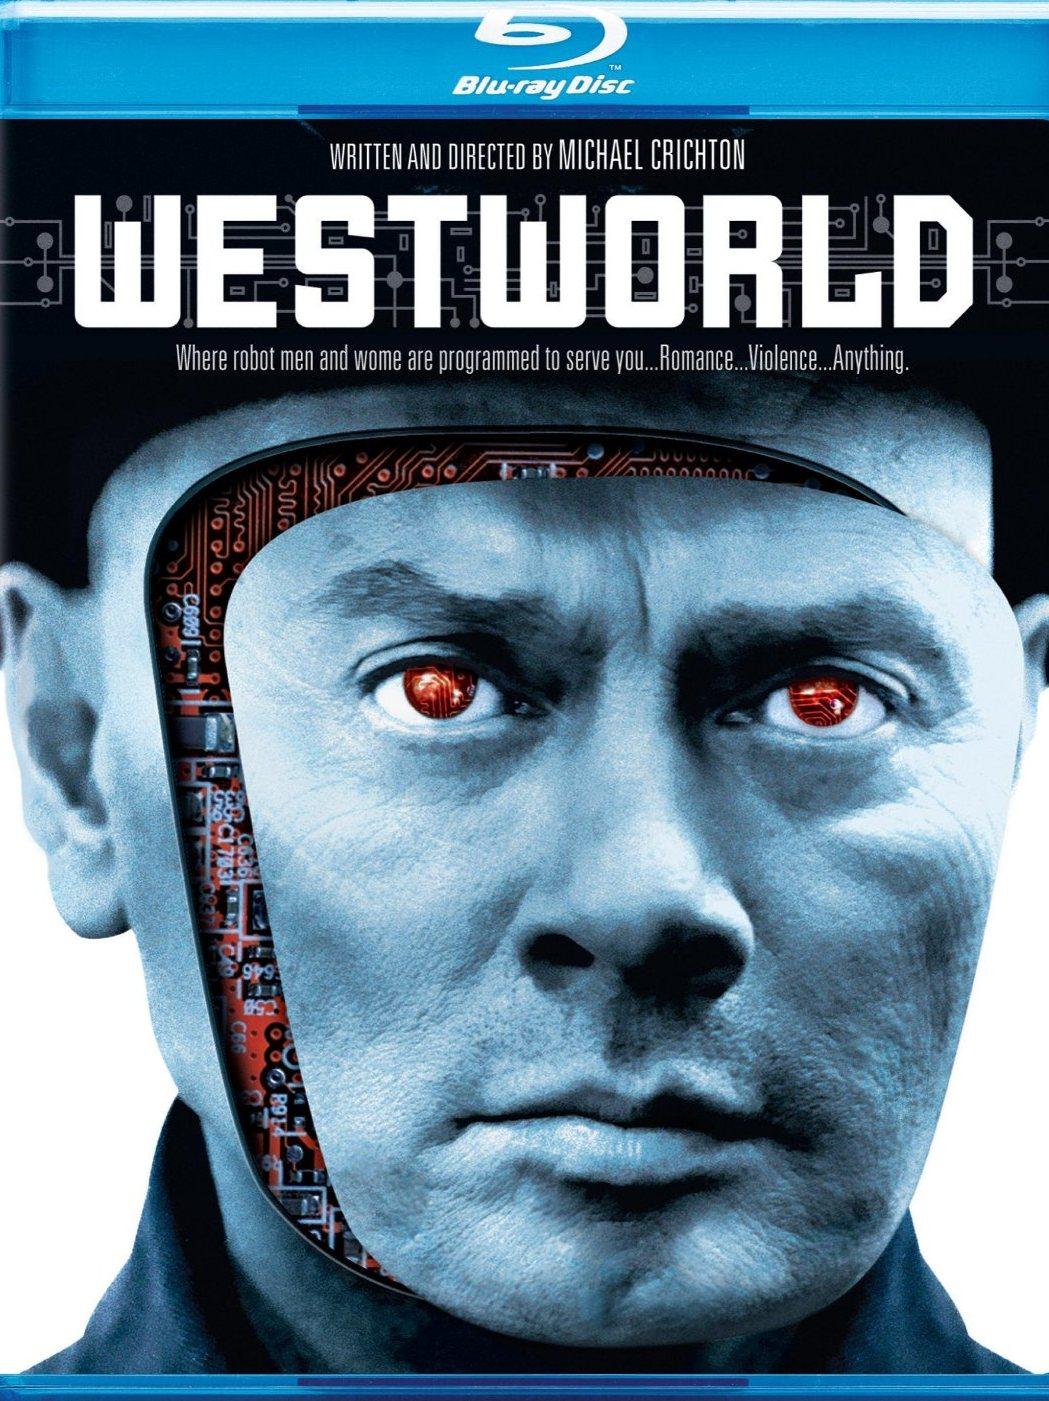 westworld blu ray mgm 1973 warner home video